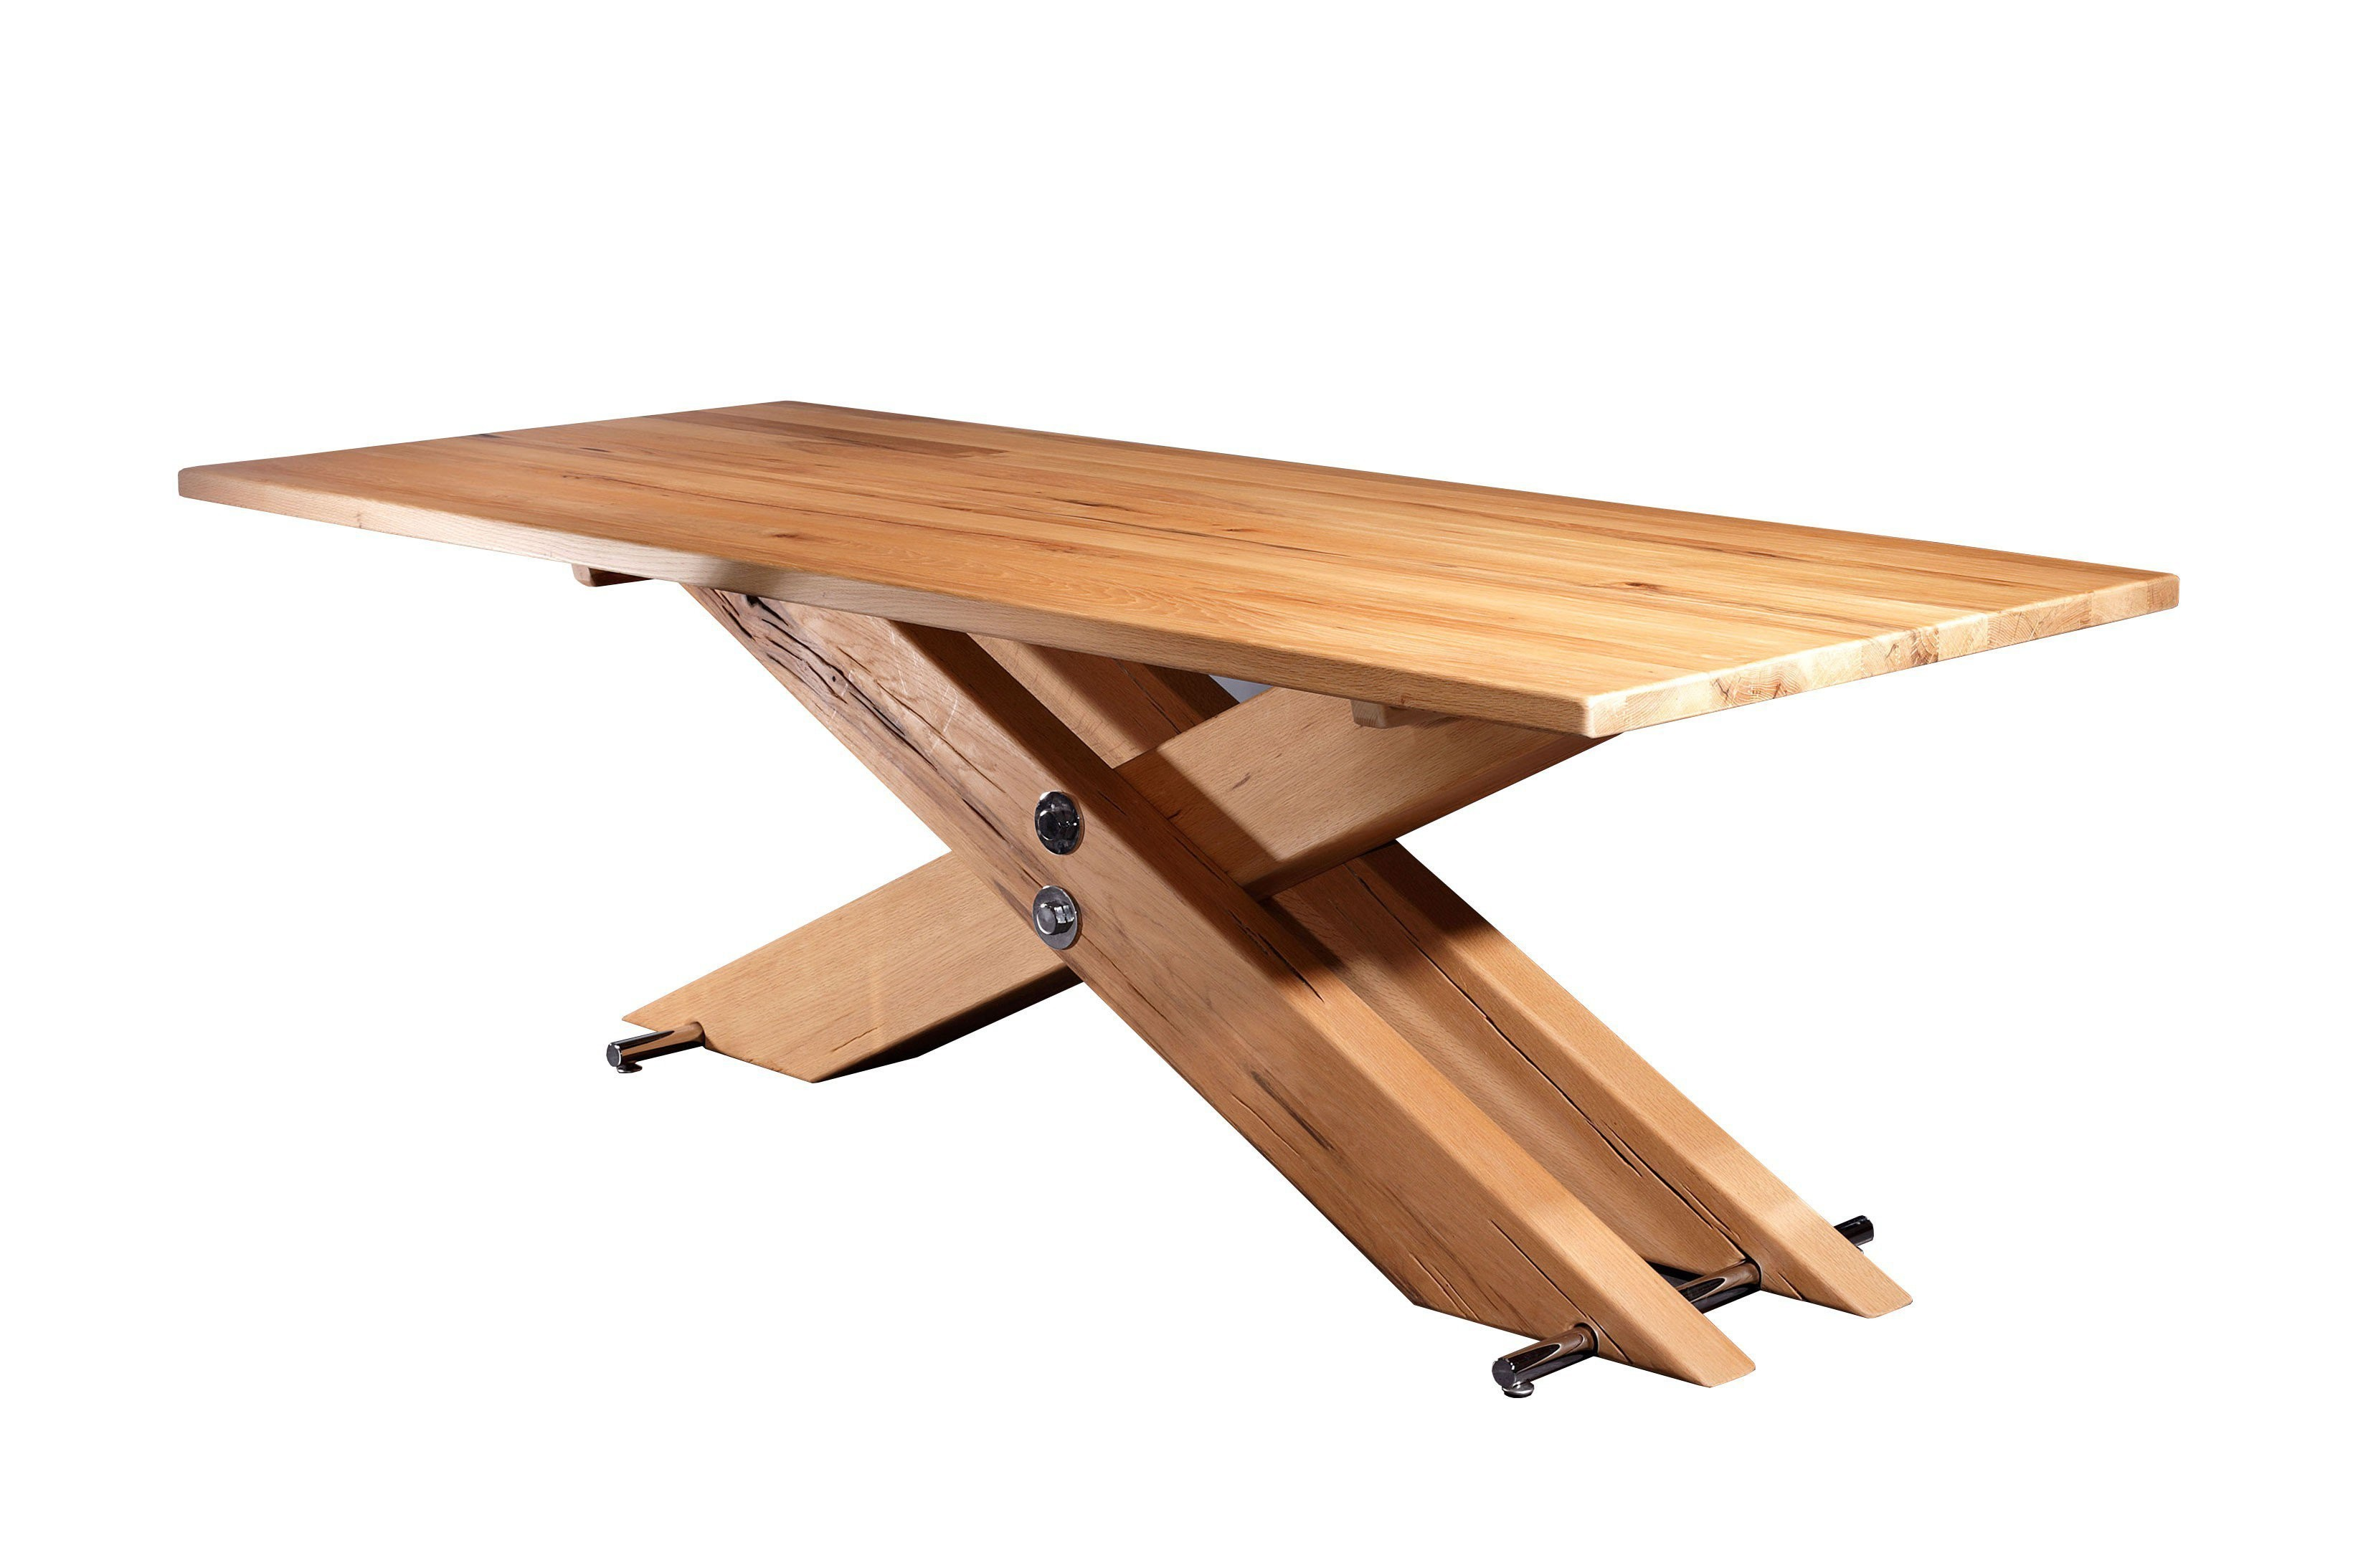 Sprenger Kruezfuss Tisch 01